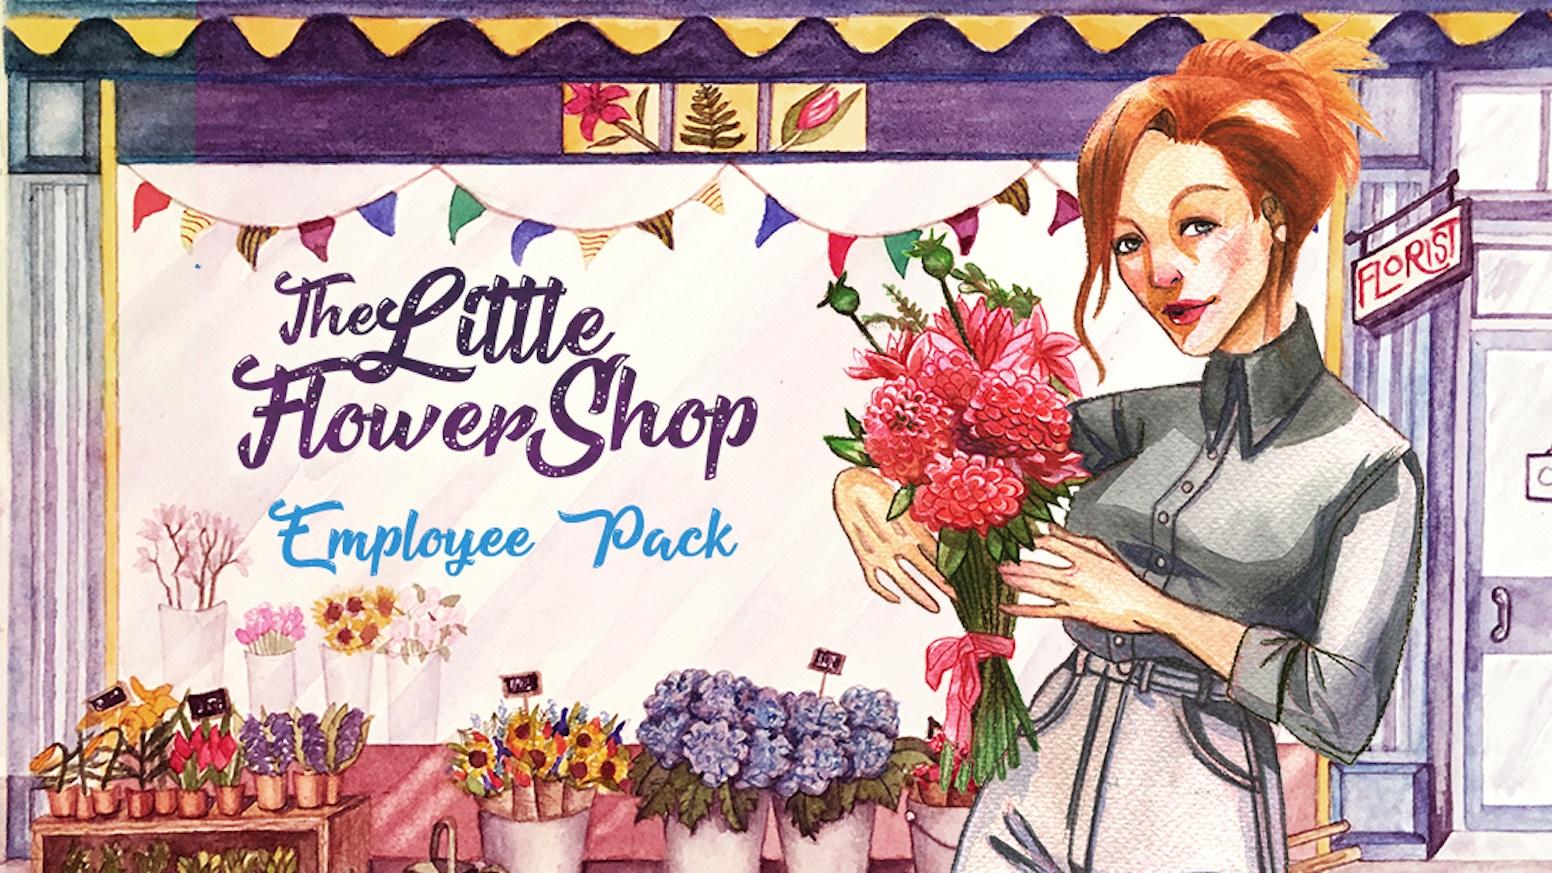 A 10-card mini-expansion for Dr Finn's Little Flower Shop, plus reprints of prior promotional packs.